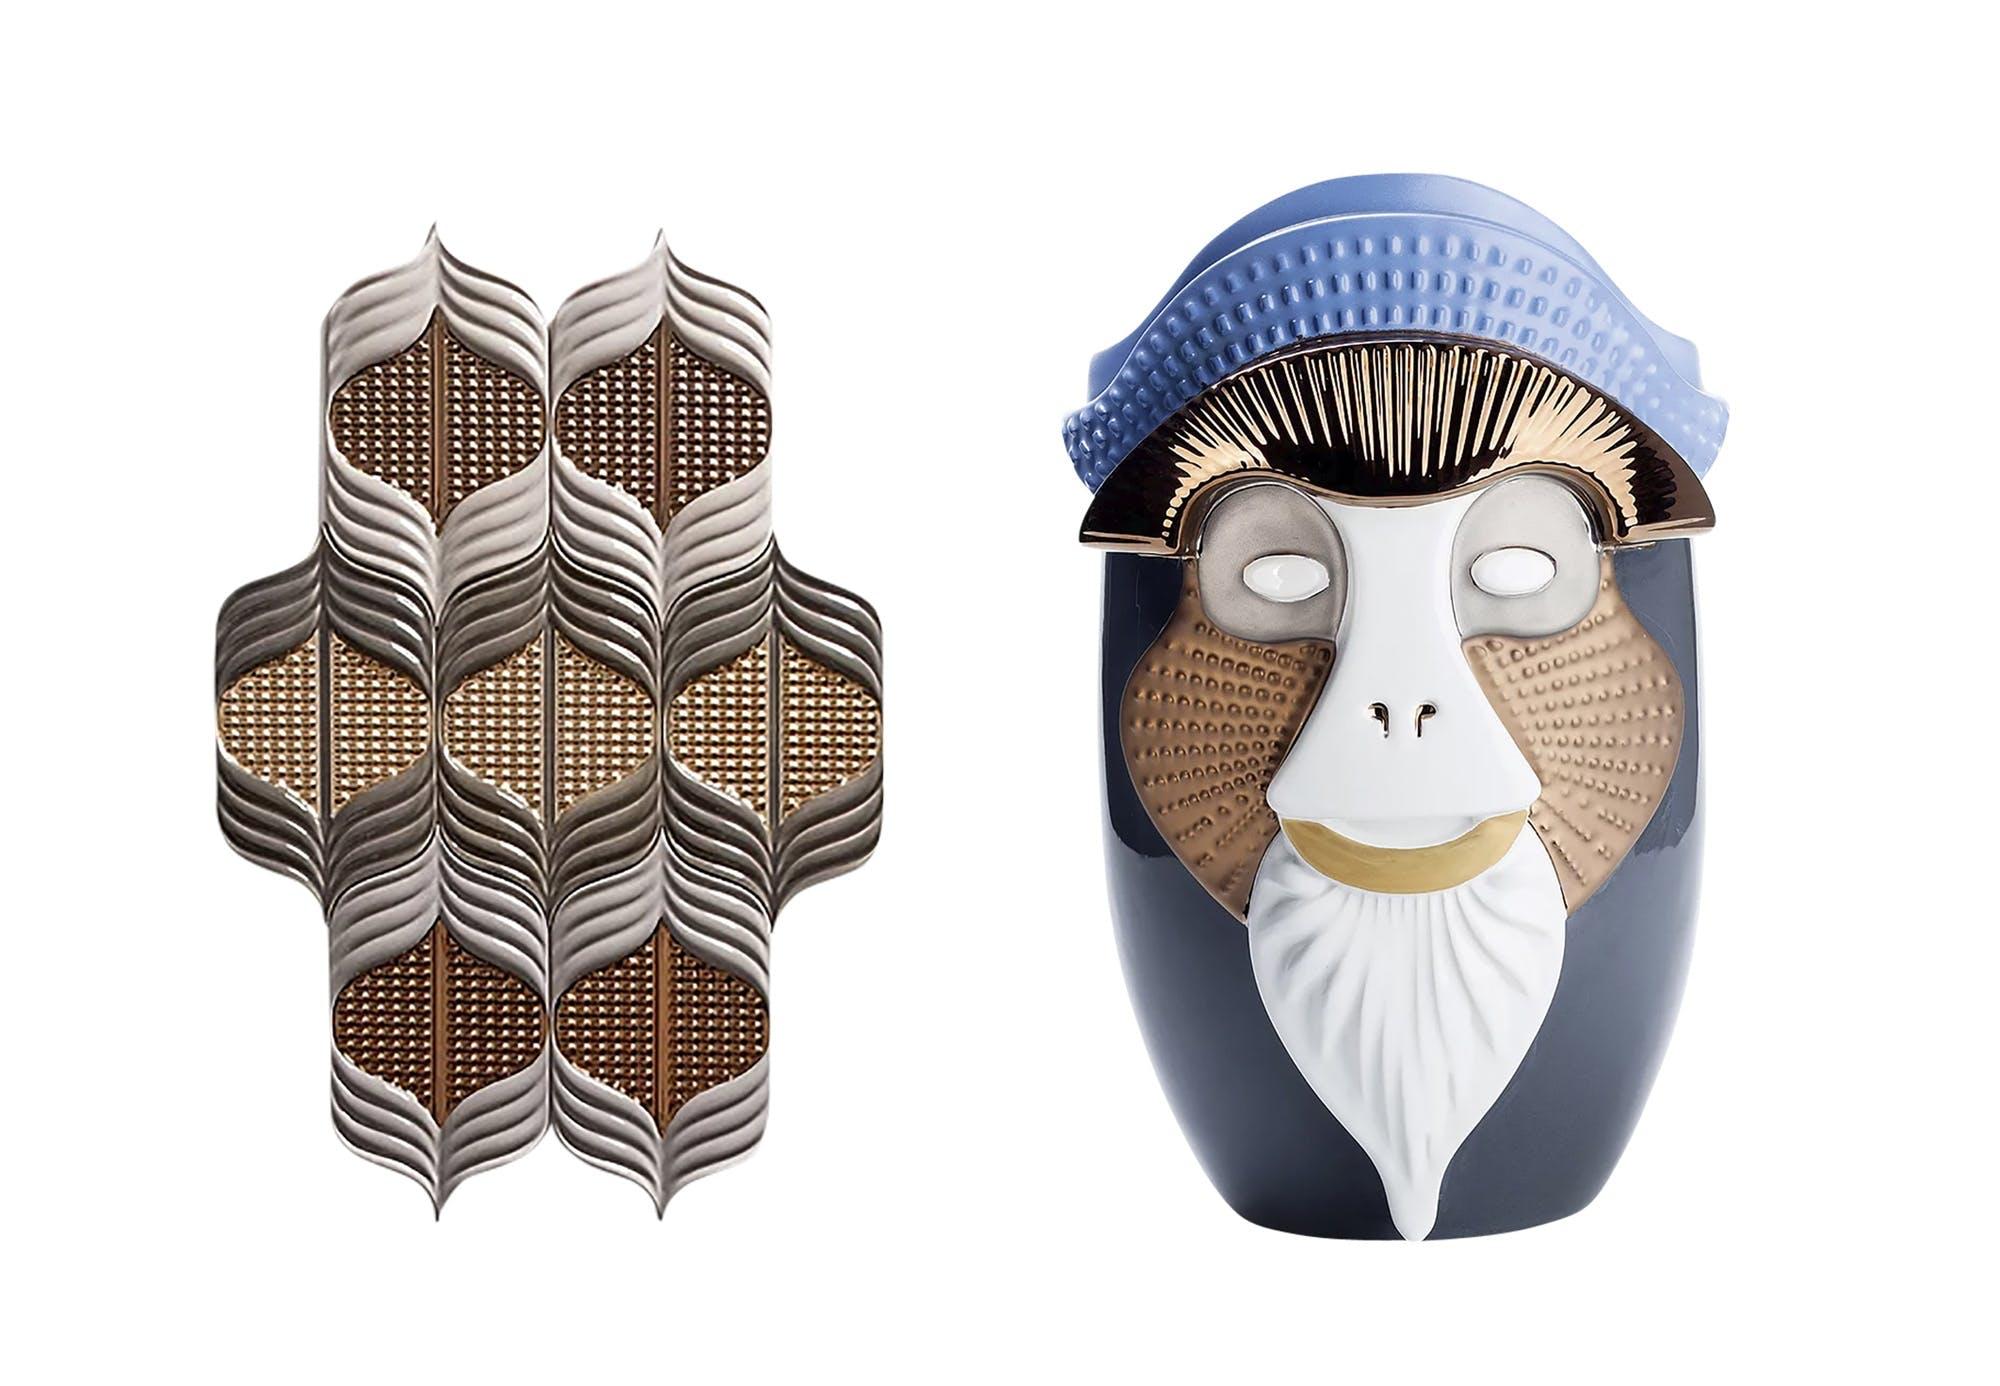 trend bo bedre romantik masker